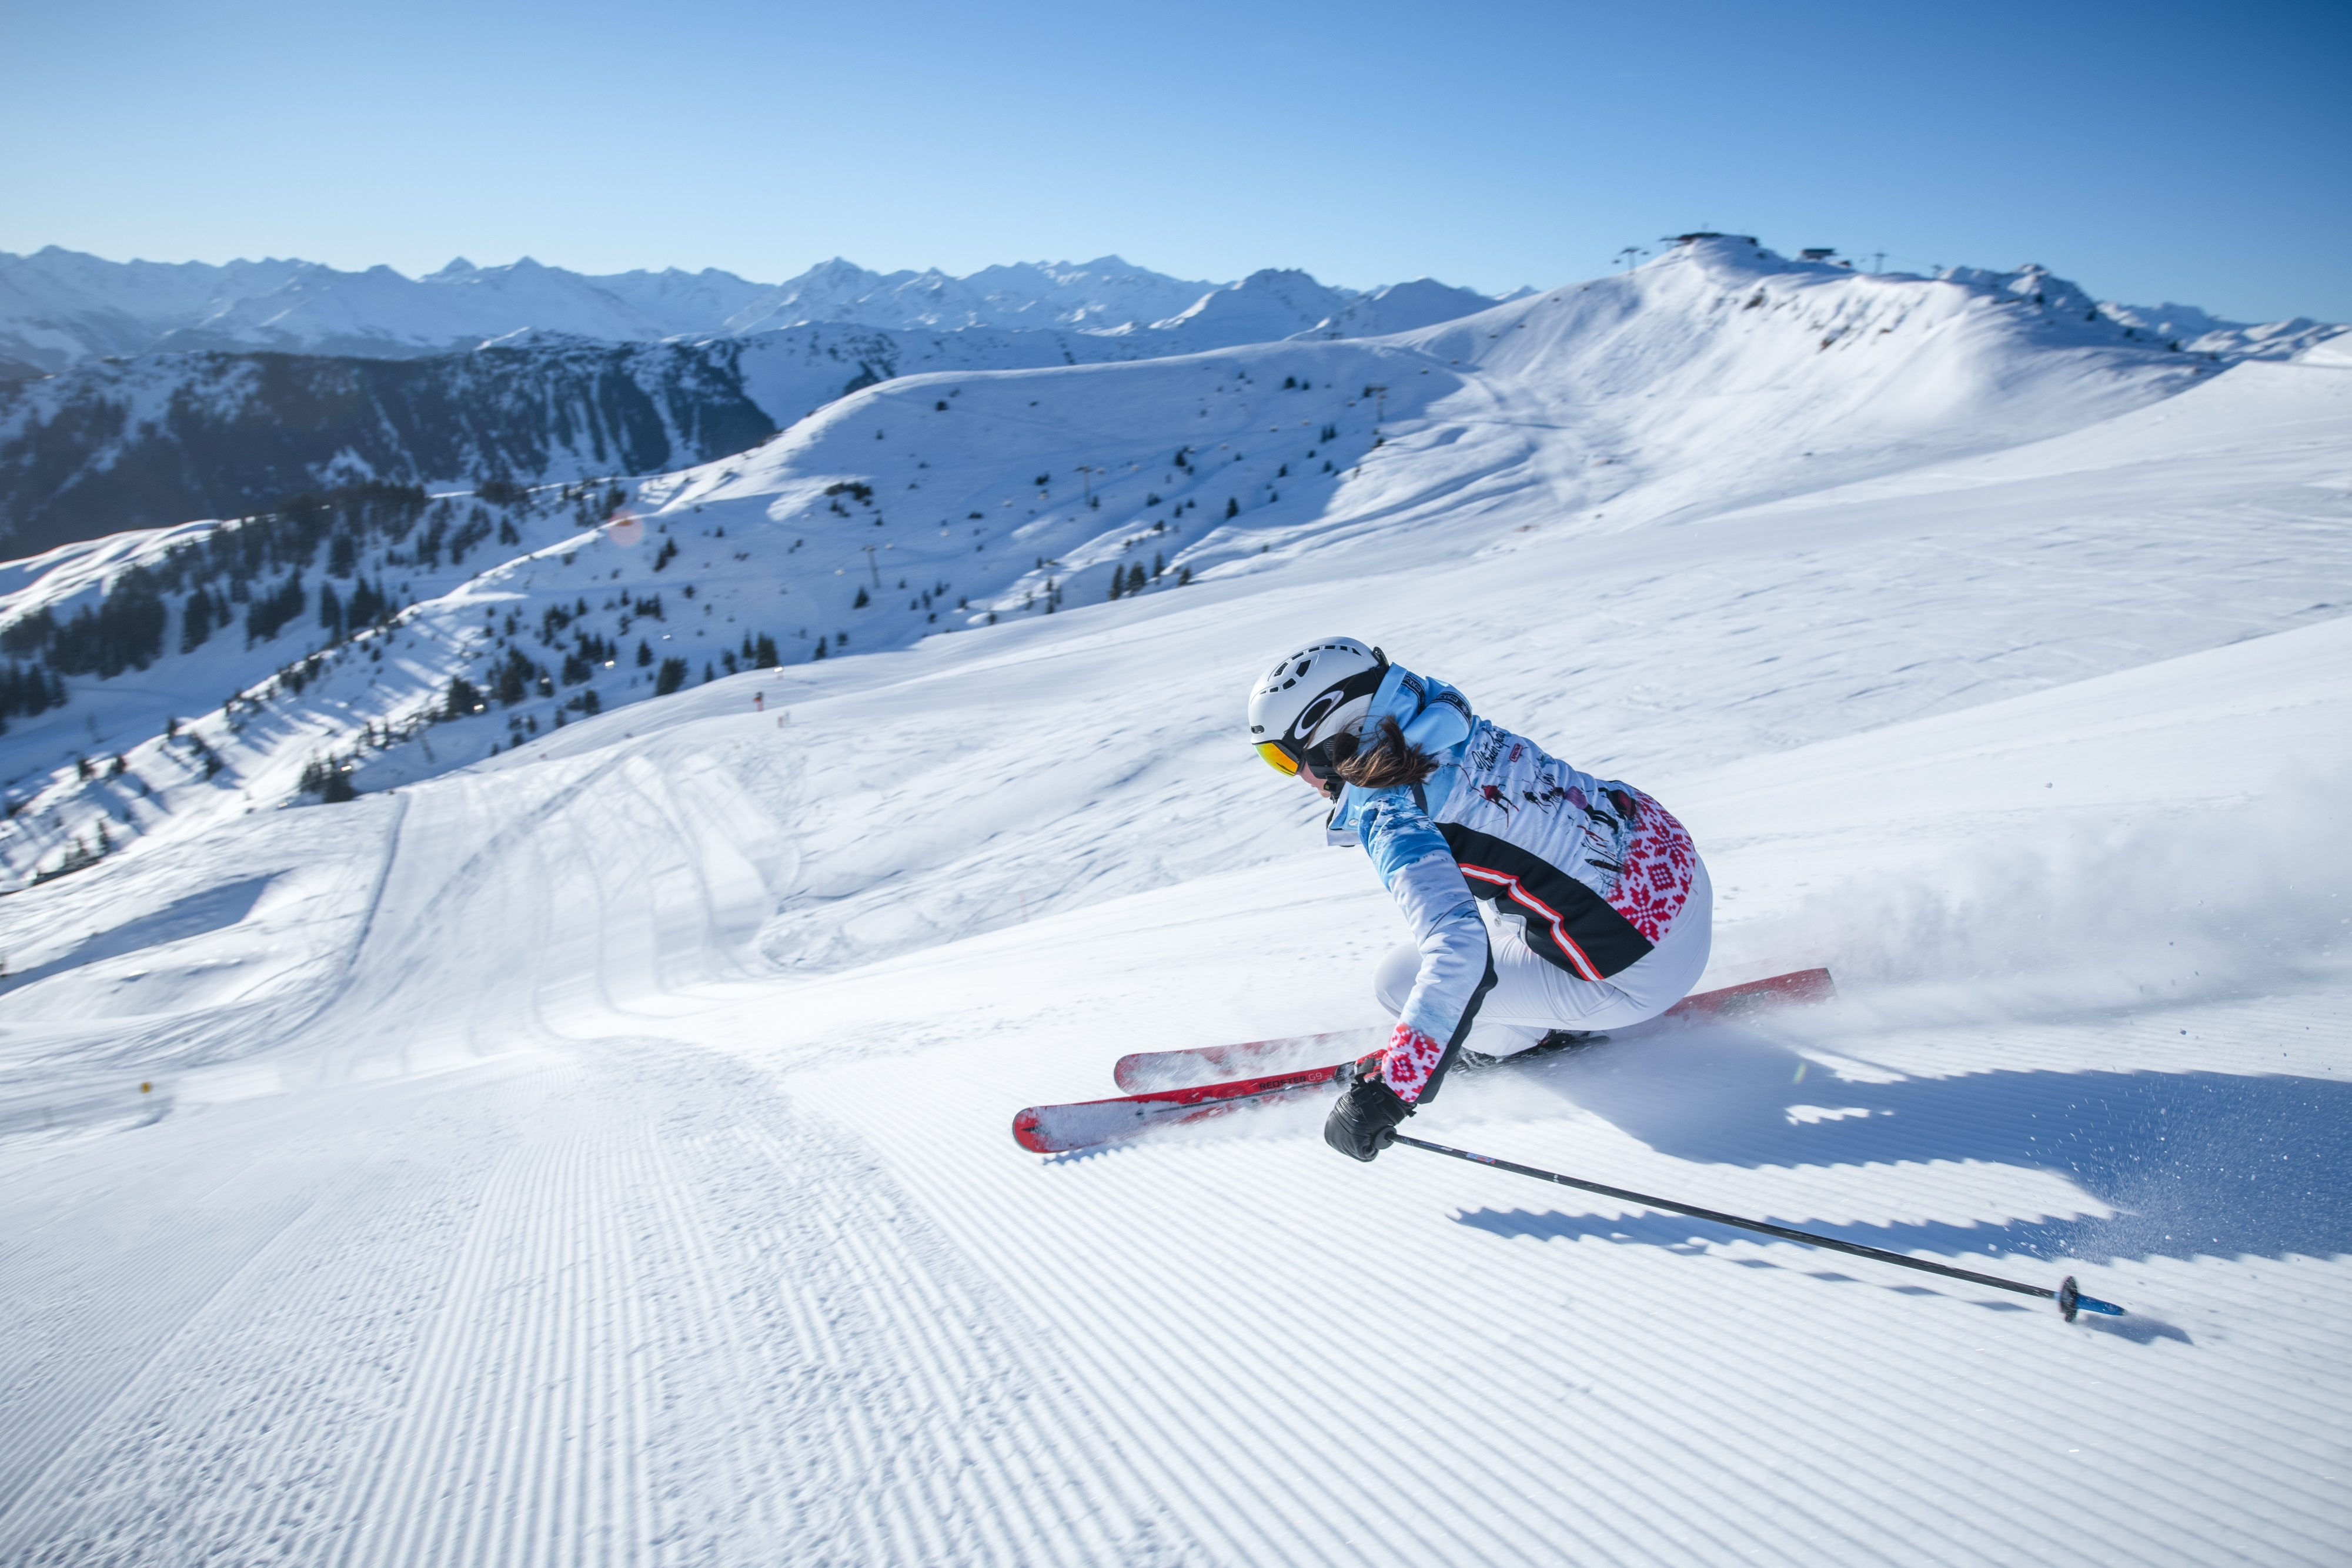 Skifahrerin aktiv im Schnee